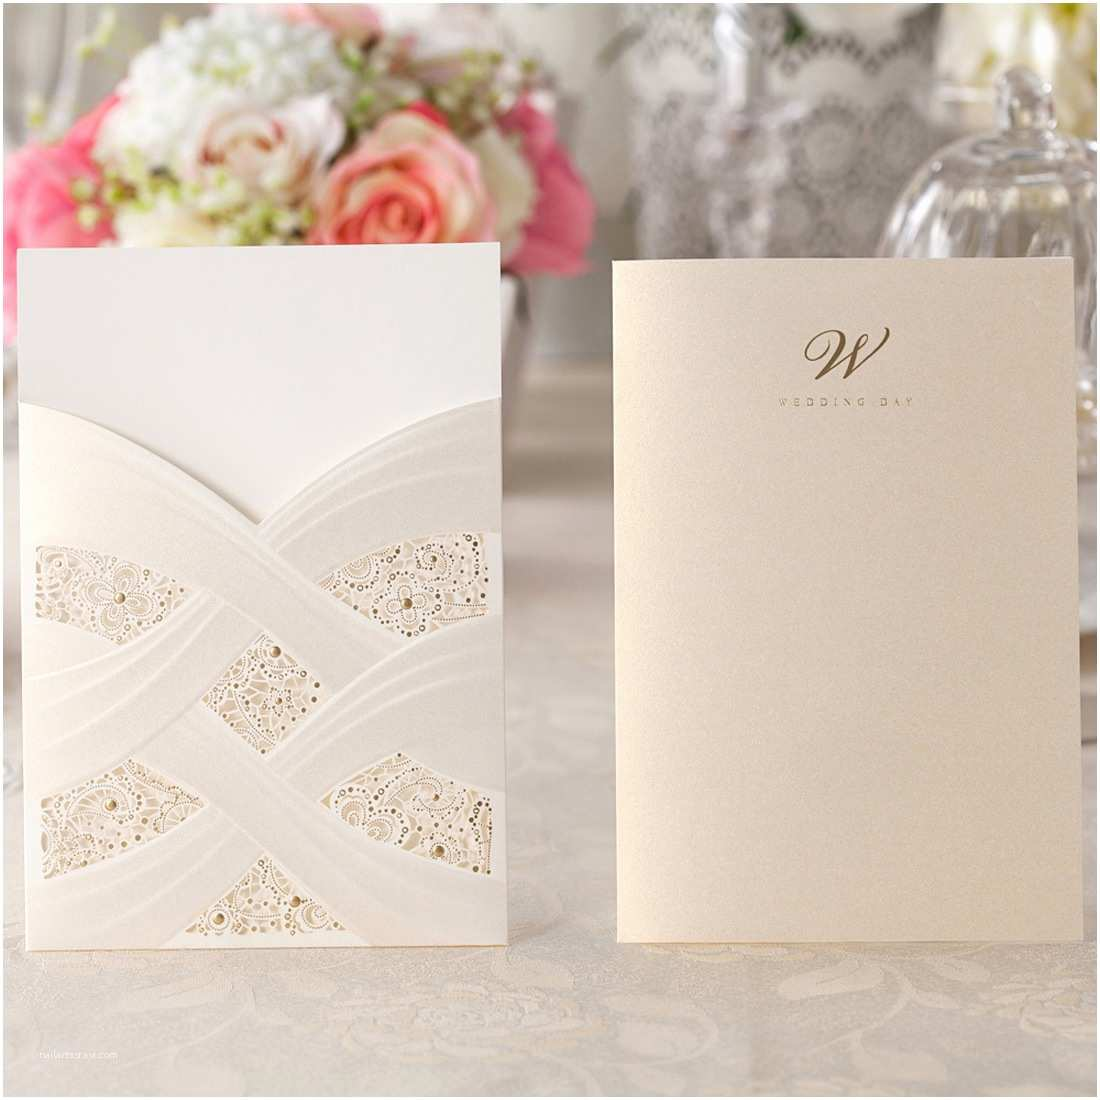 Wedding Invitation Stickers Pocket Wedding Invitation Card Kit Cw060 with Envelope